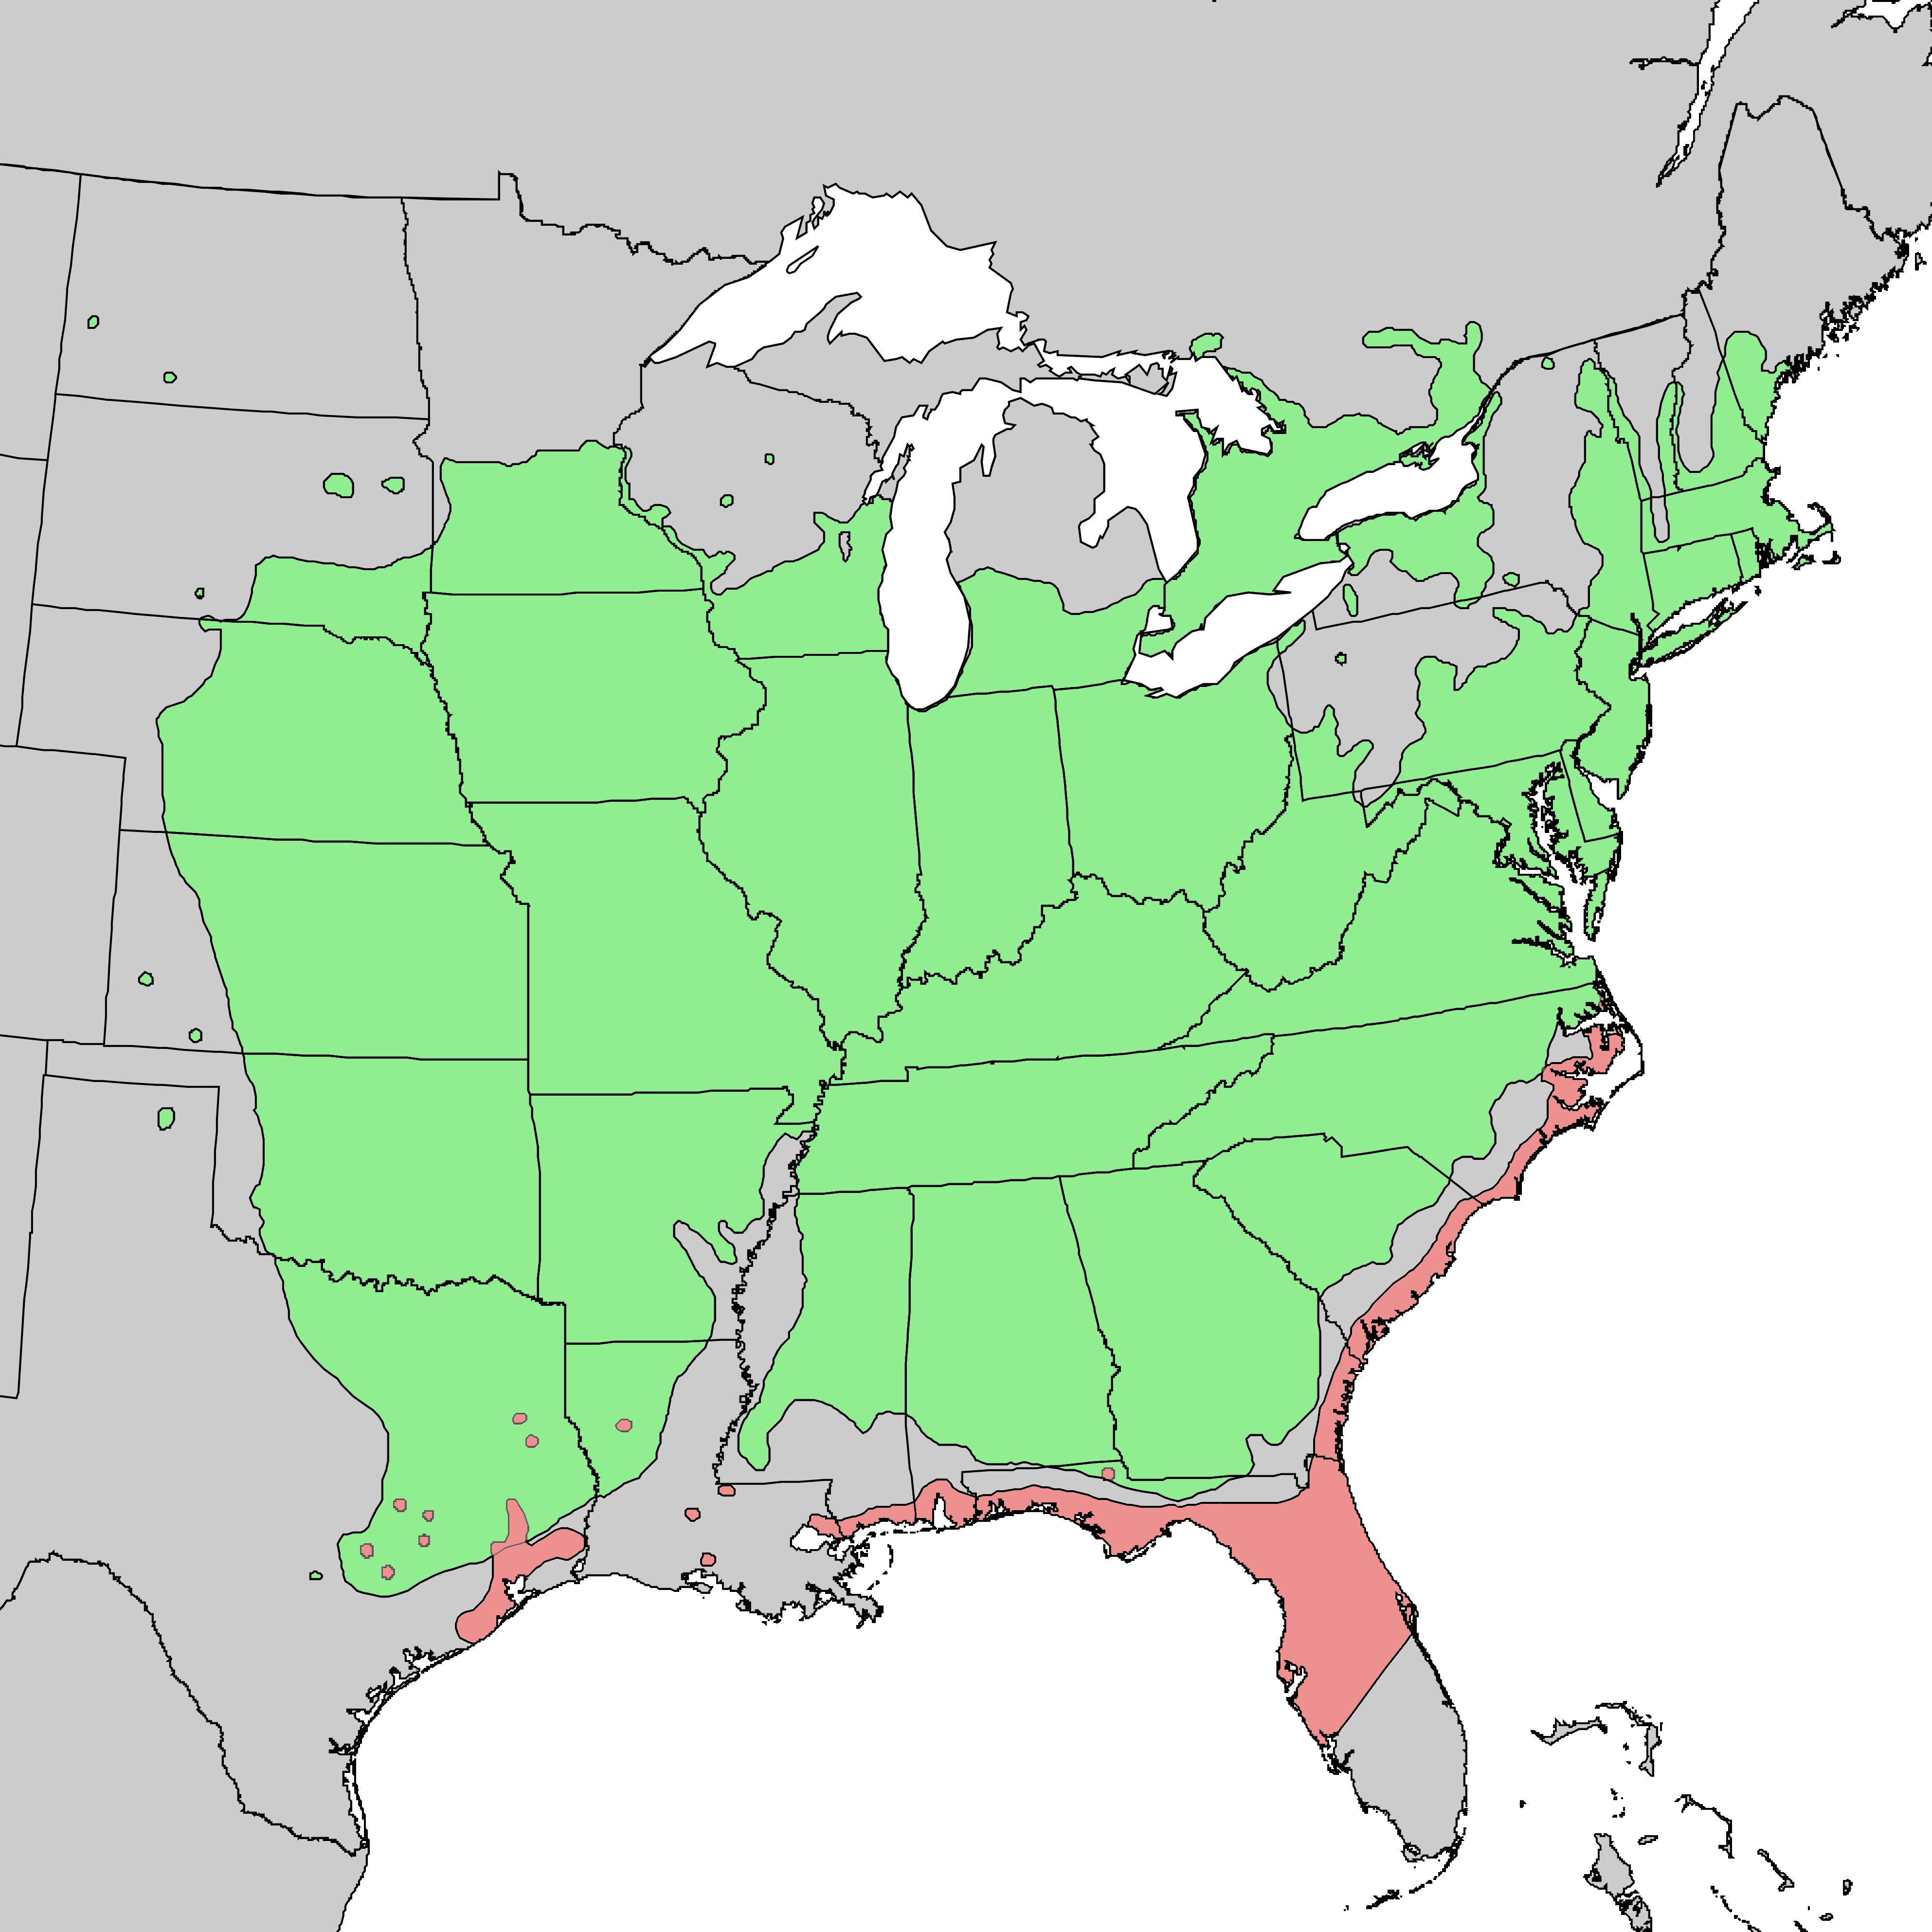 Distribution map of eastern redcedar